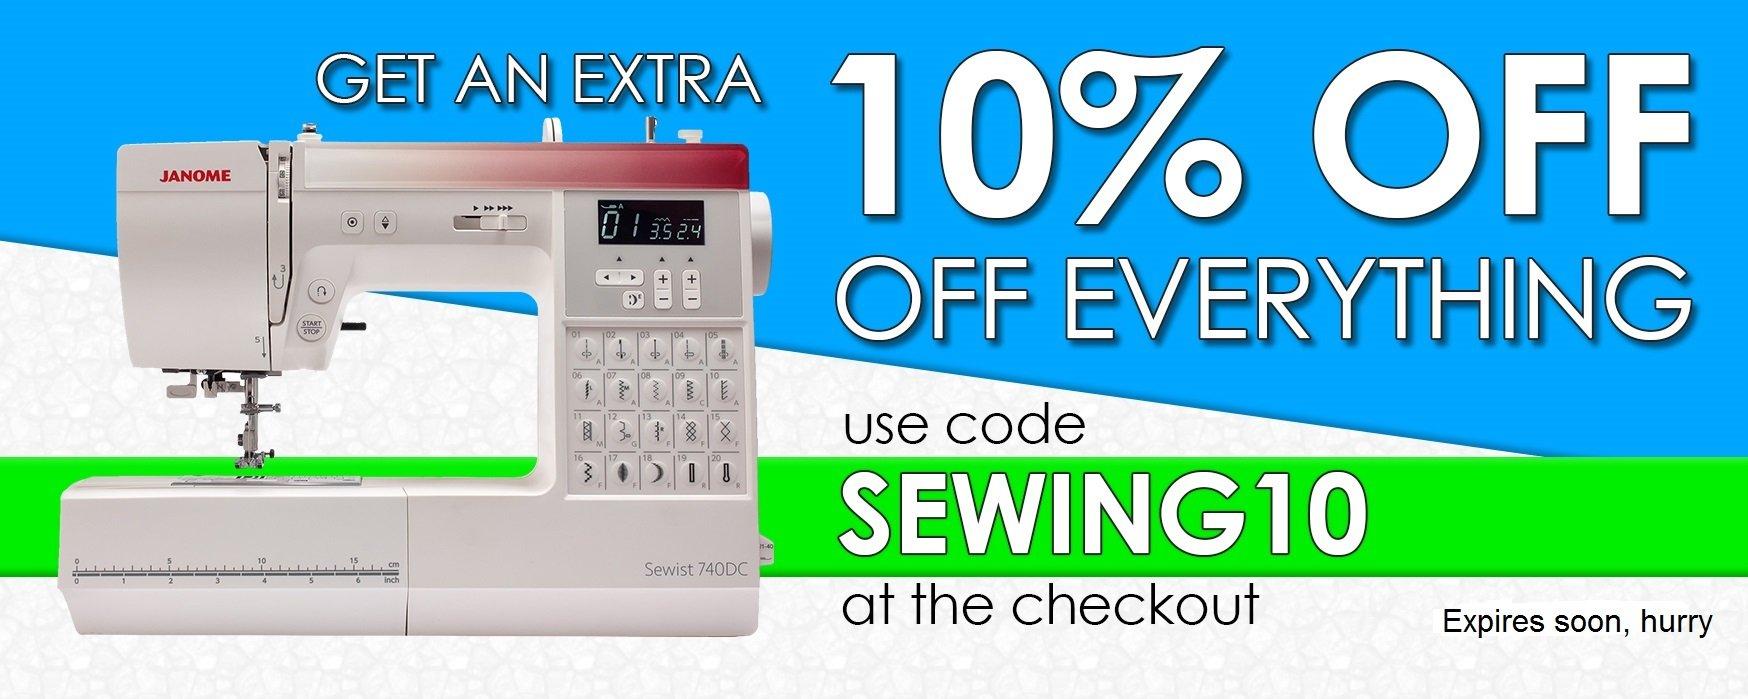 Elna 580 sewing machine - The Sewing Machine Company